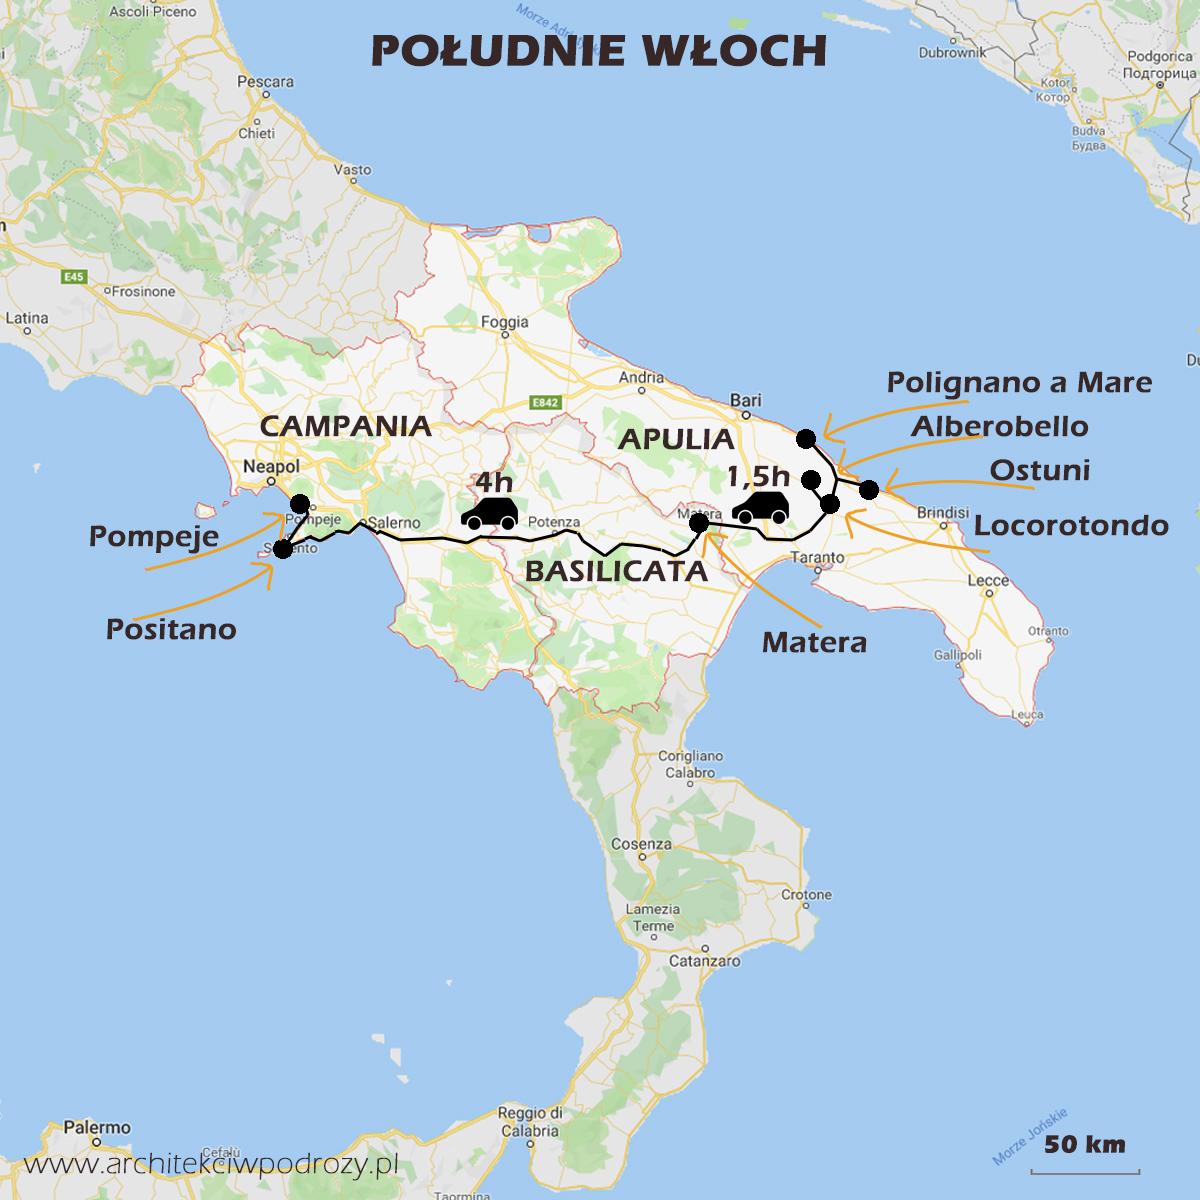 01 POLUDNIEWLOCH mapa r1 - Południe Włoch